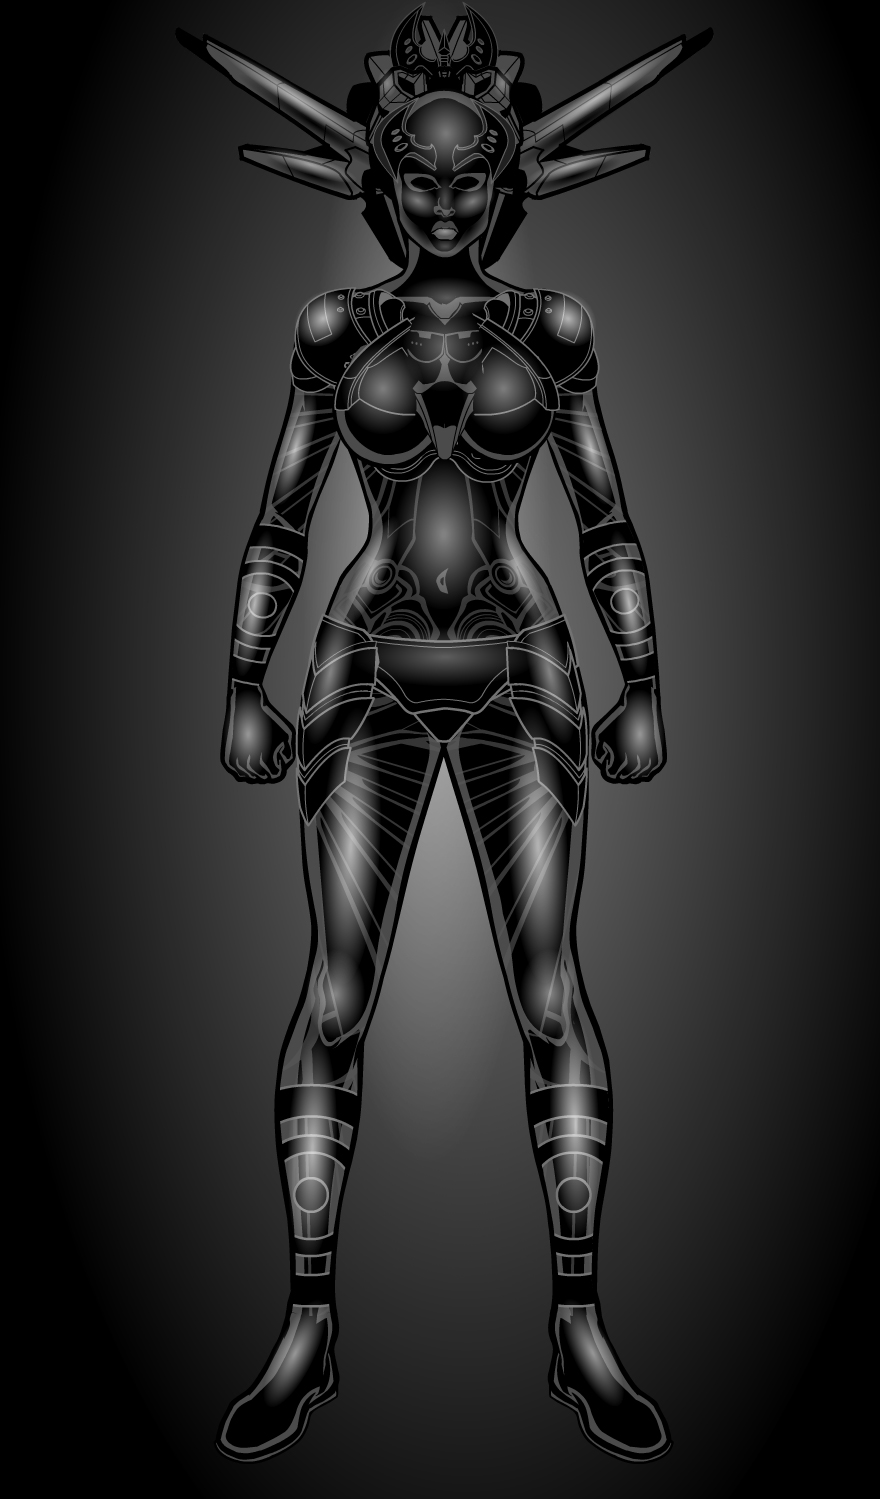 http://www.heromachine.com/wp-content/legacy/forum-image-uploads/dblade/2013/09/dblade_BlackVoid.jpg